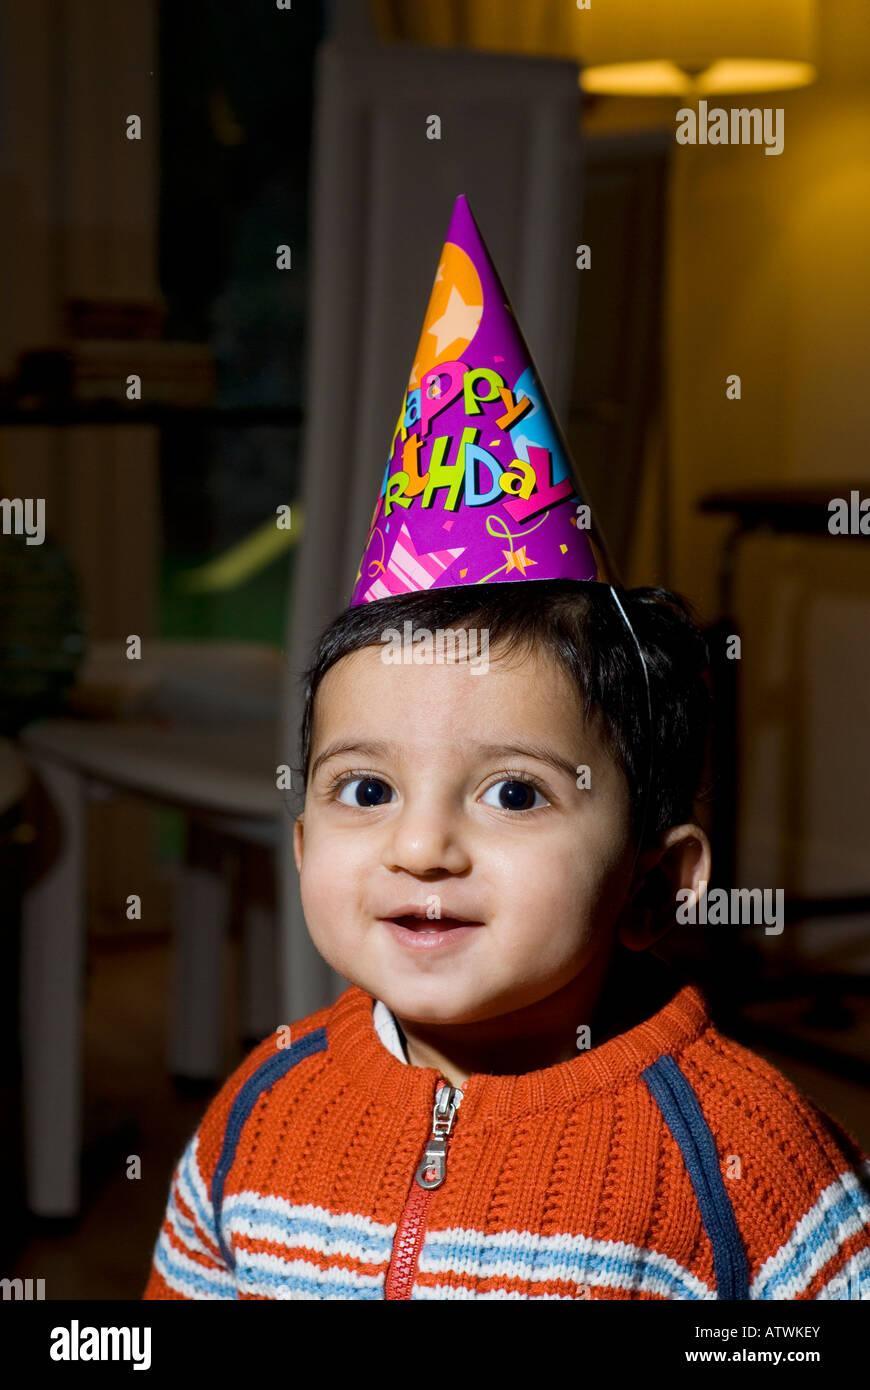 One Year Old Baby Boy Wearing Happy Birthday Cone Hat